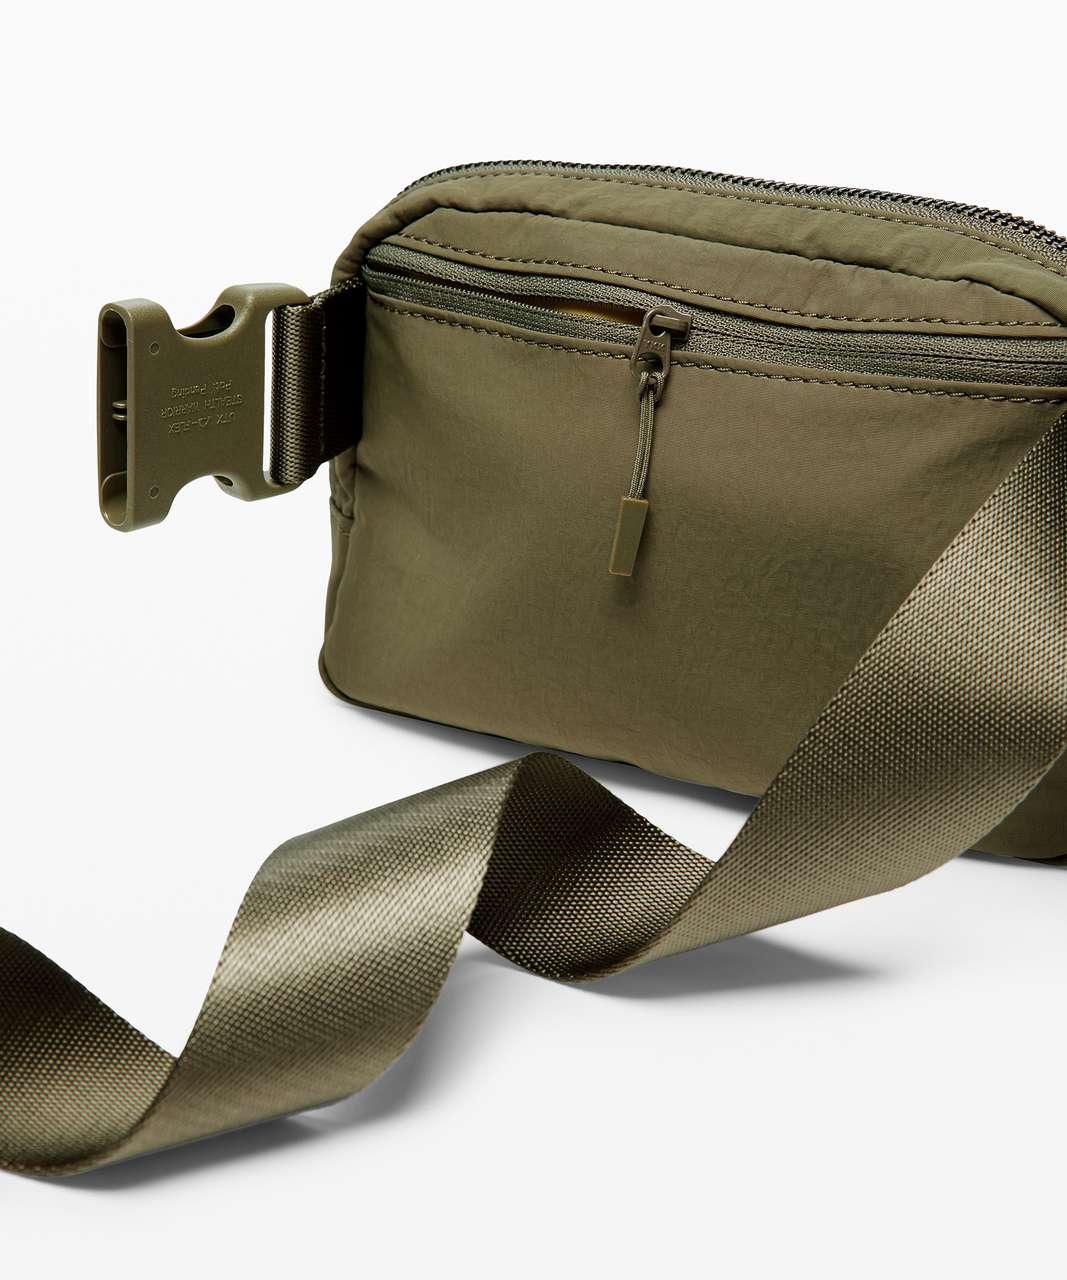 Lululemon Everywhere Belt Bag *1L - Medium Olive